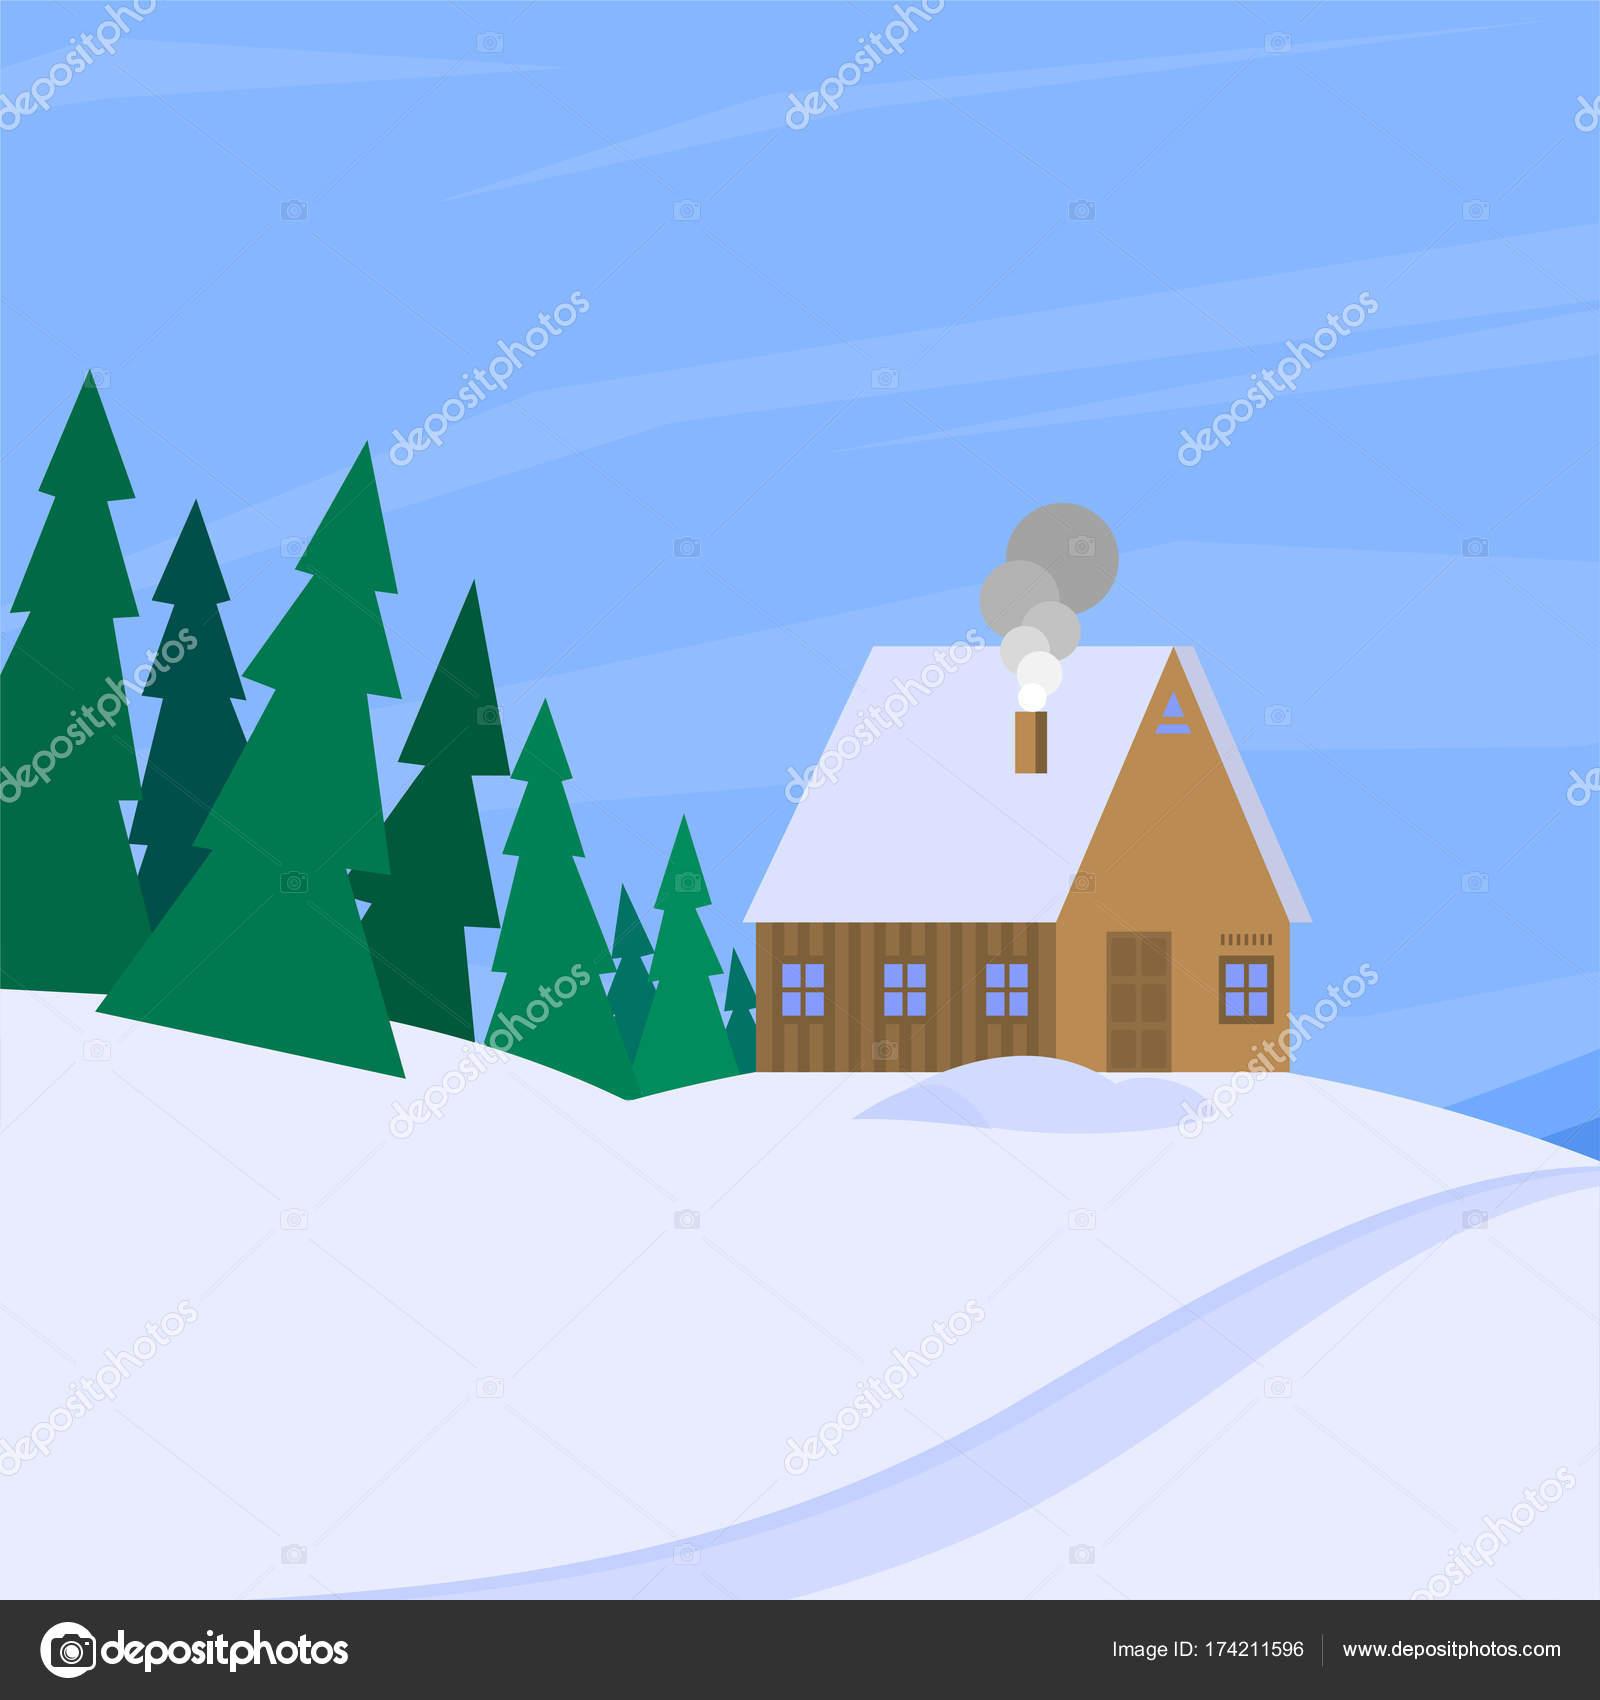 Cool Wallpaper Mountain Christmas - depositphotos_174211596-stock-illustration-winter-landscape-with-christmas-tree  2018_257659.jpg